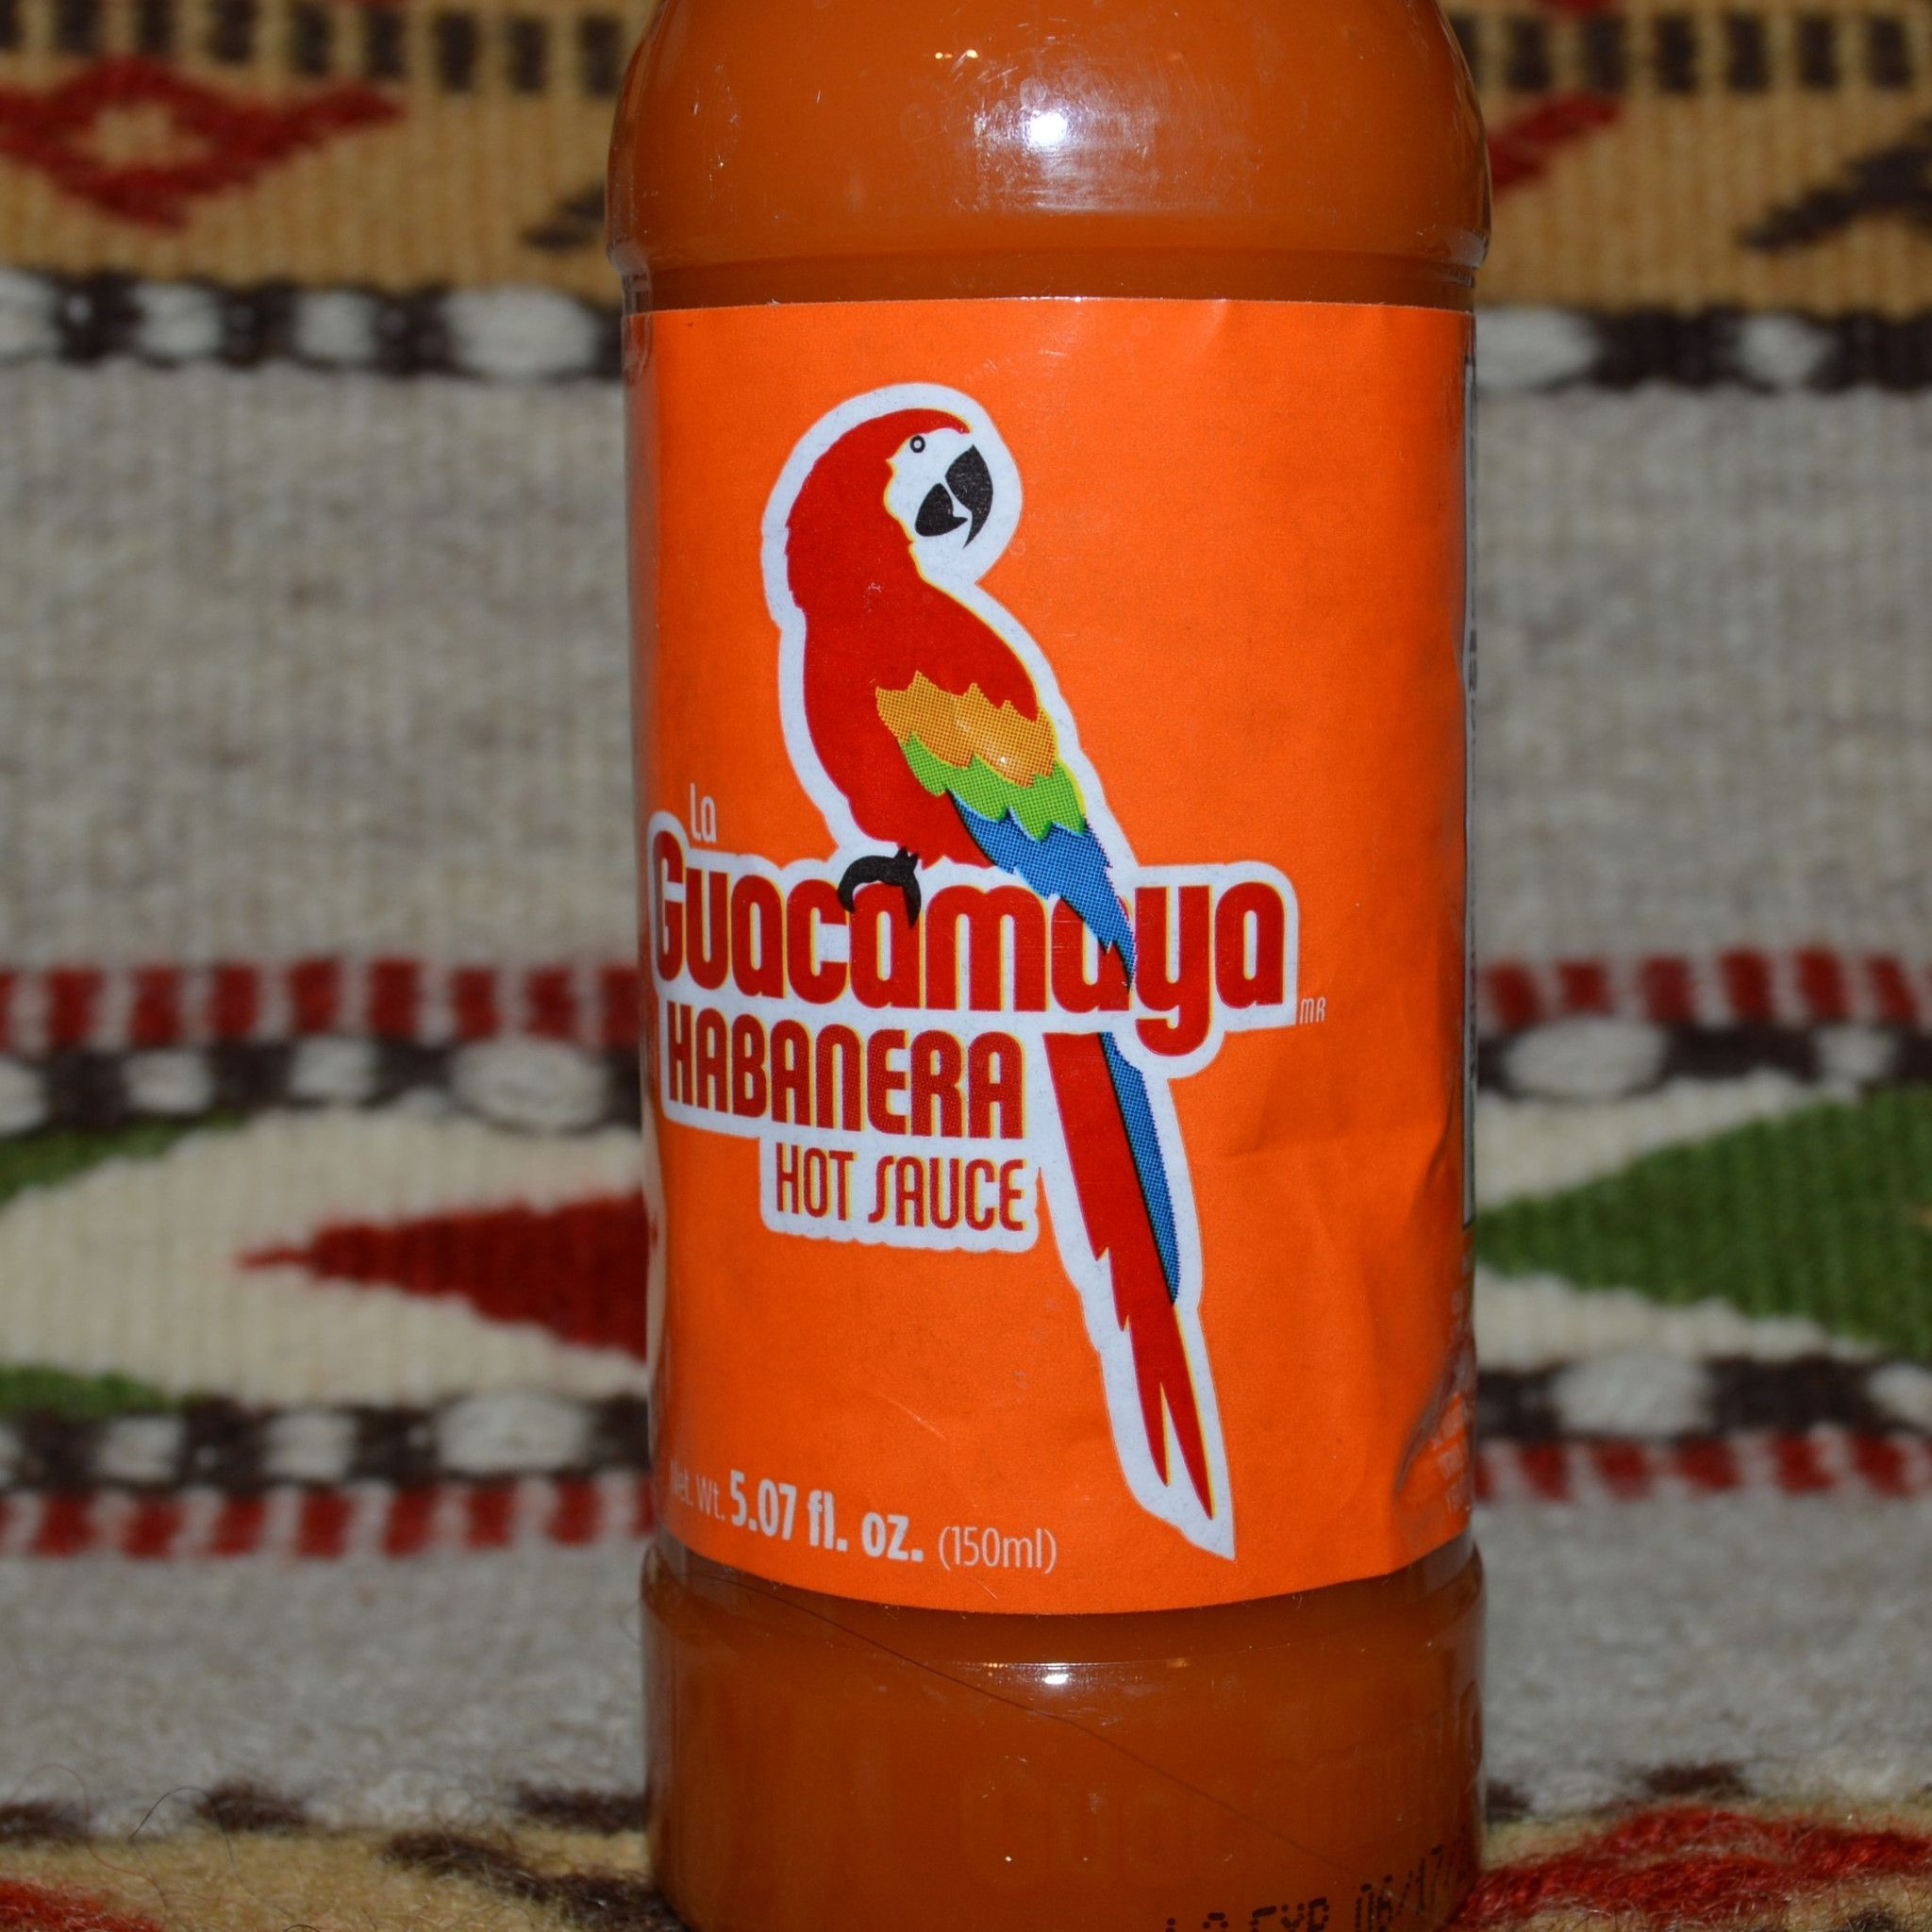 La Guacamaya Extra Hot Authentic Habanera Mexican Hot